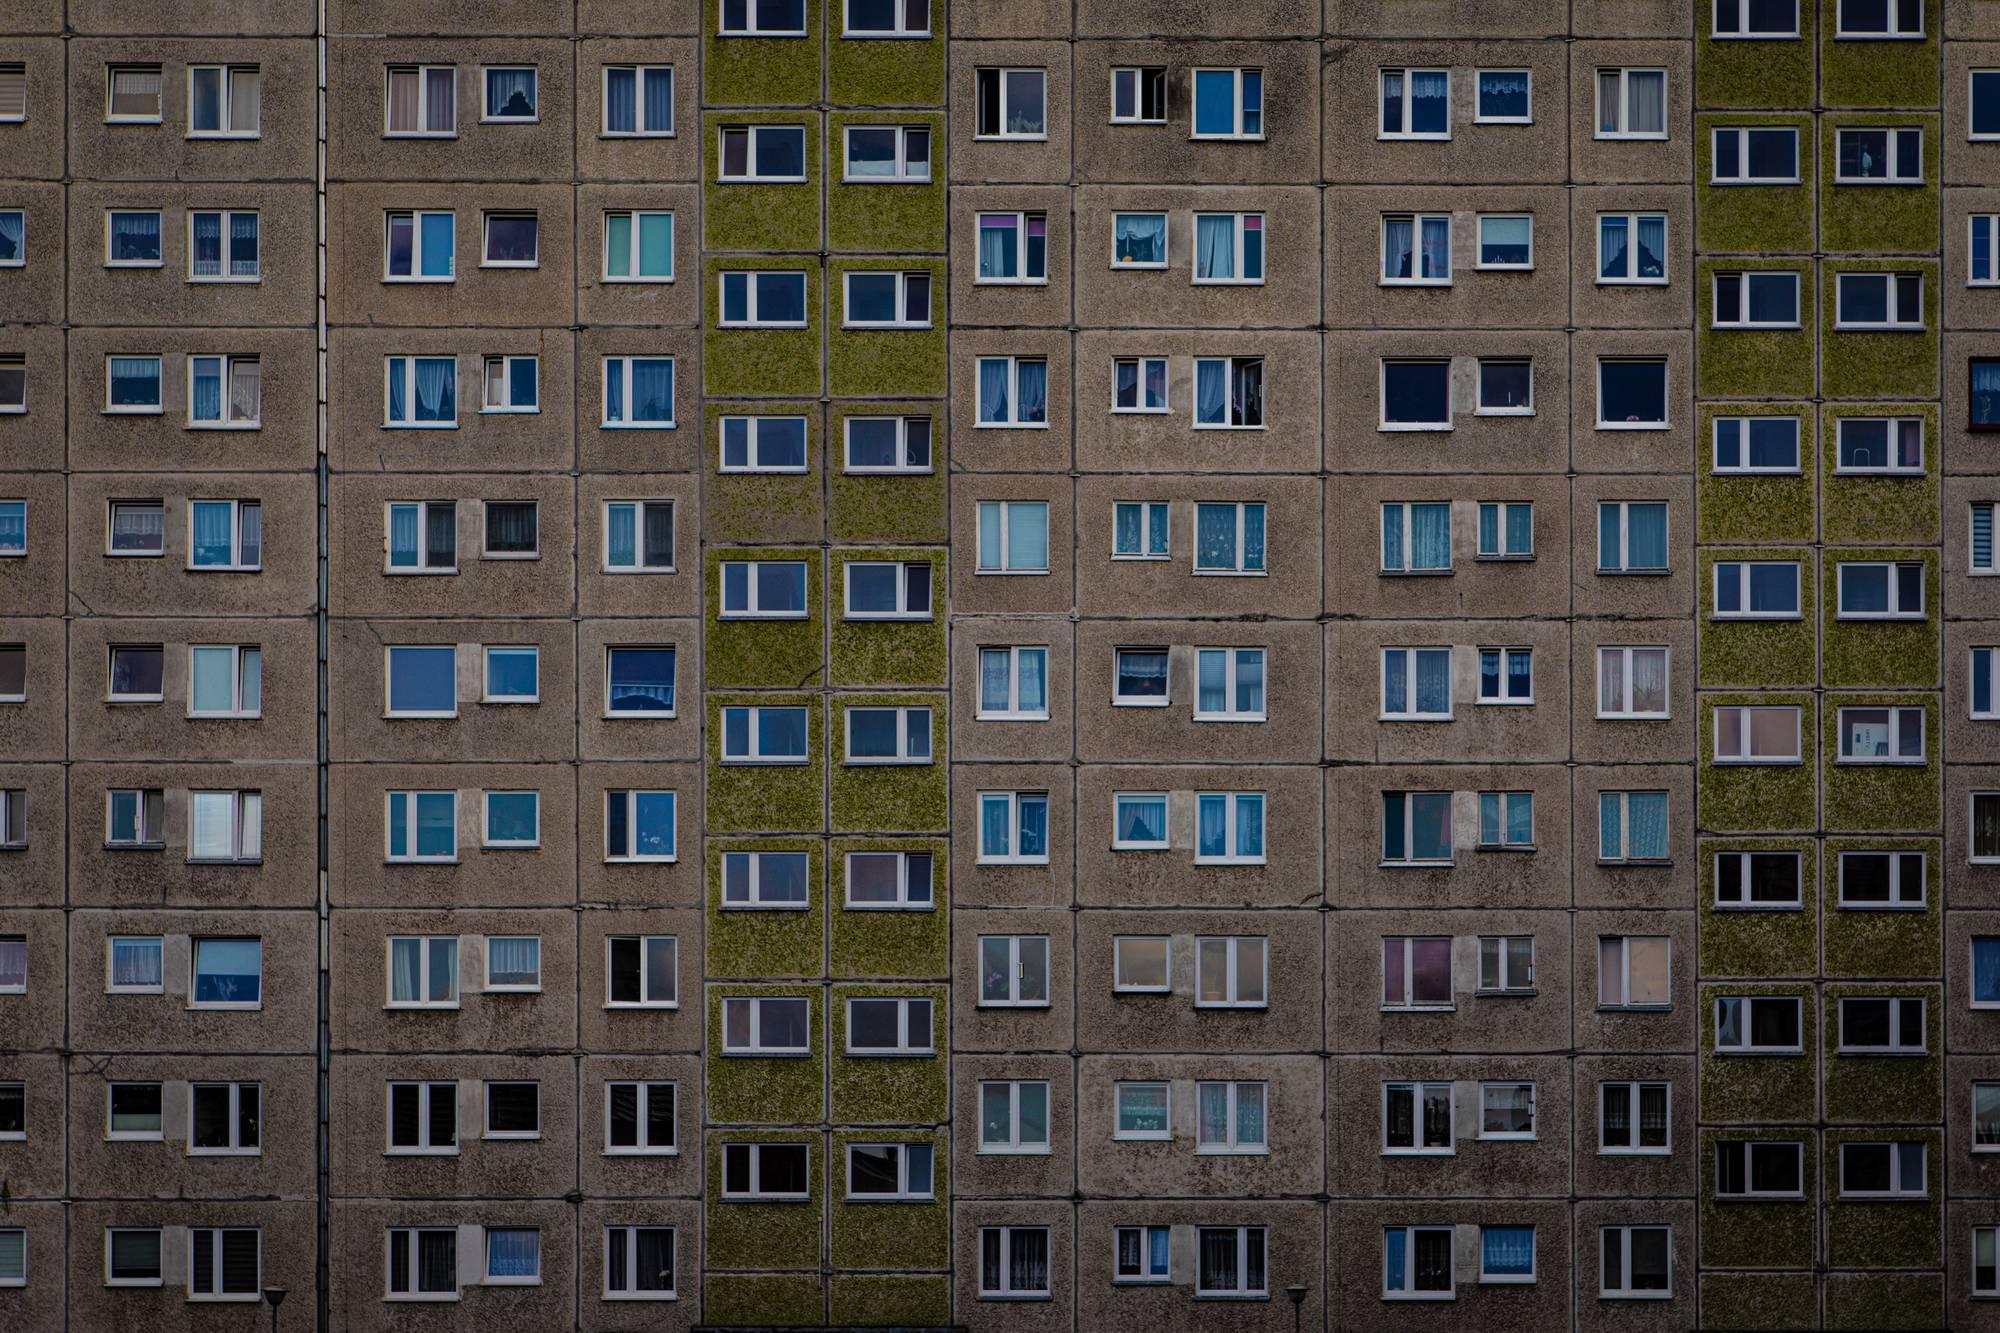 Polen Architektur Plattenbauten 01 INTERNET